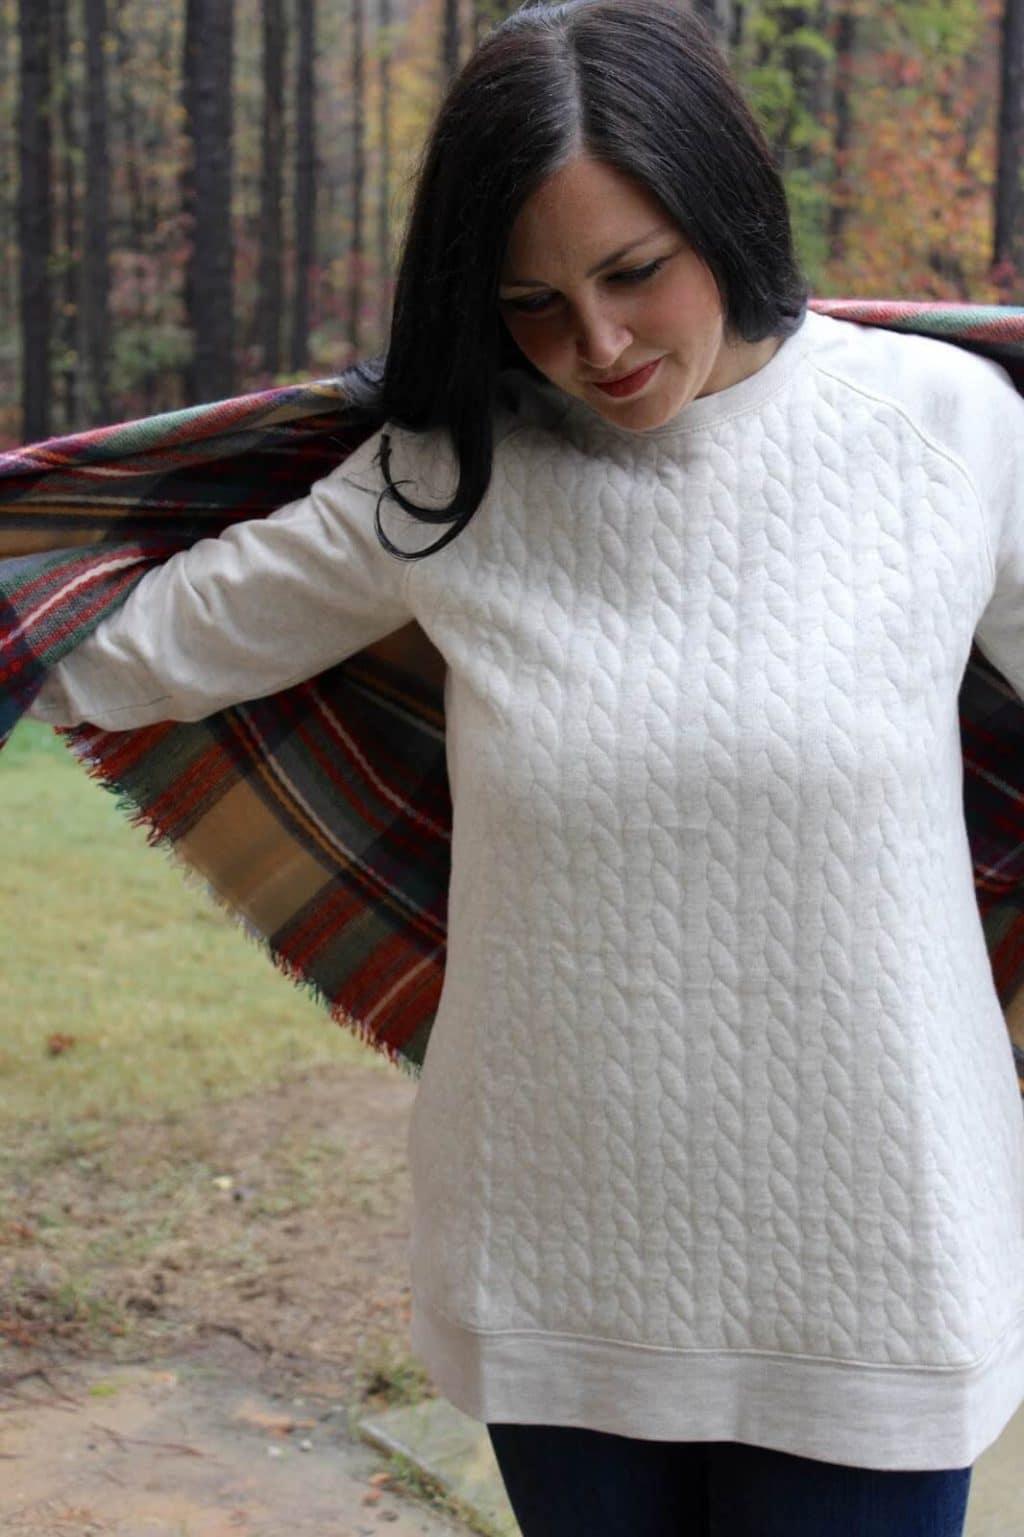 Quilted sweatshirt, plaid blanket scarf